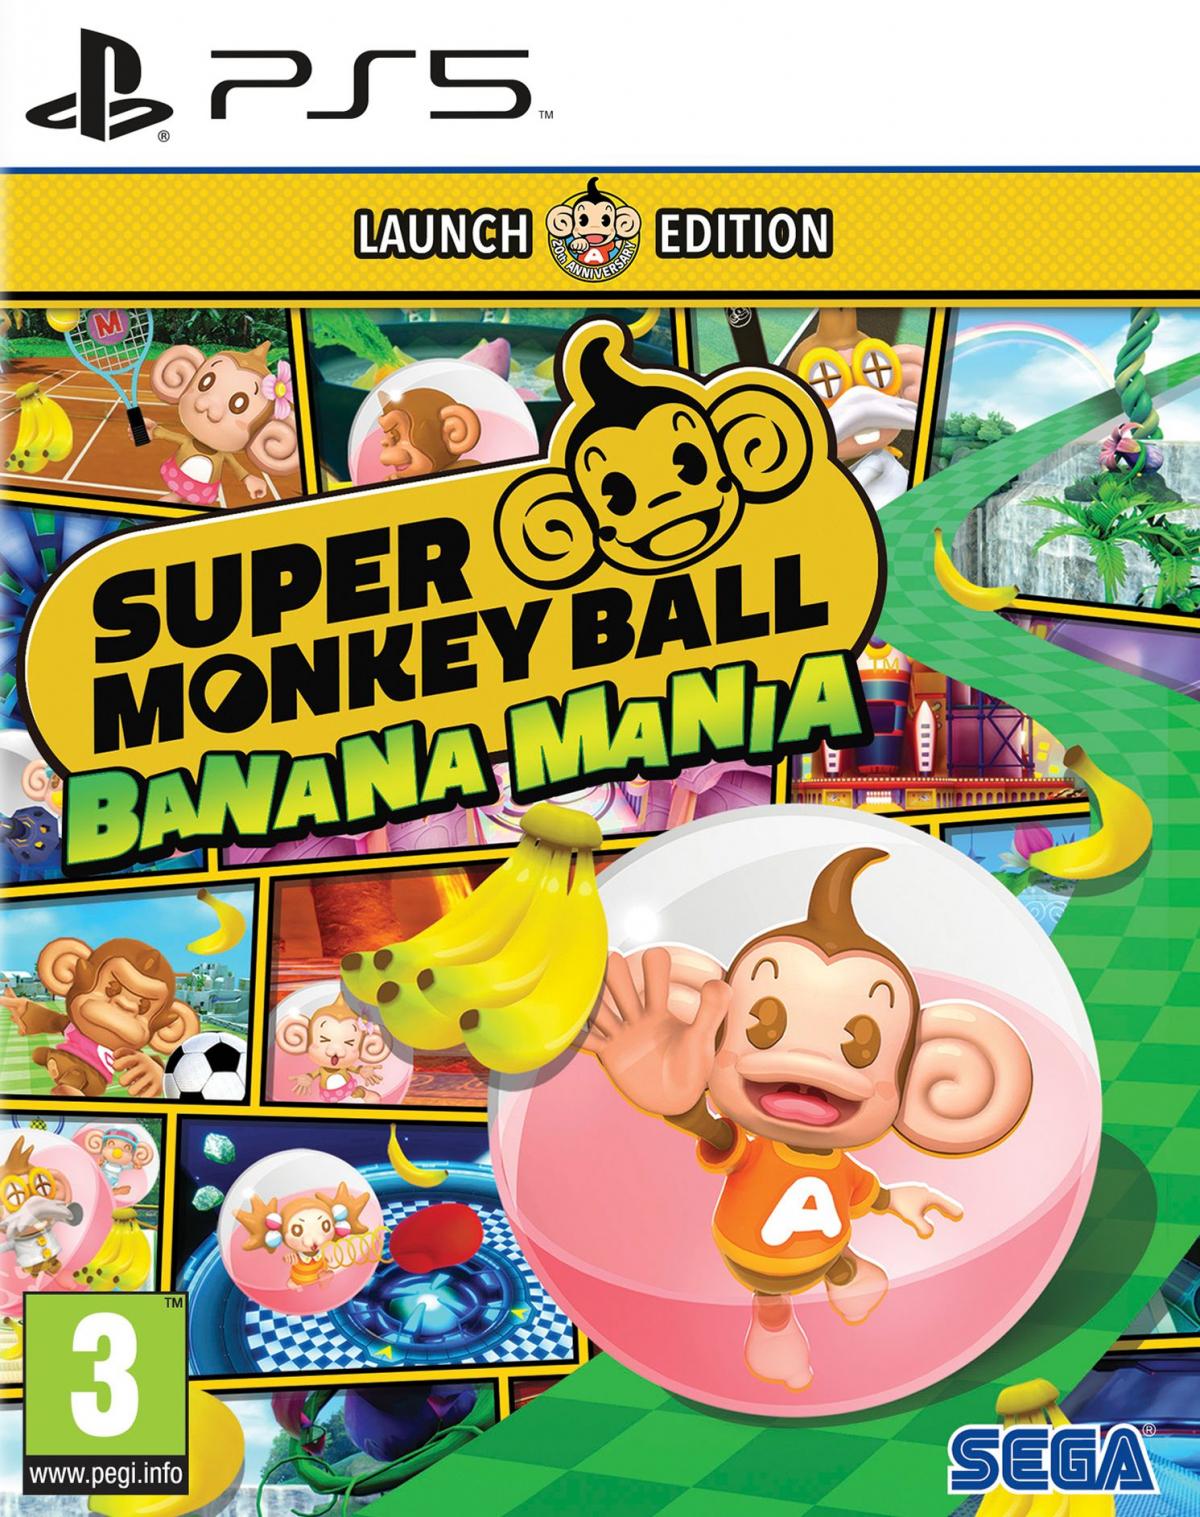 PS5 Super Monkey Ball Banana Mania Launch Edition